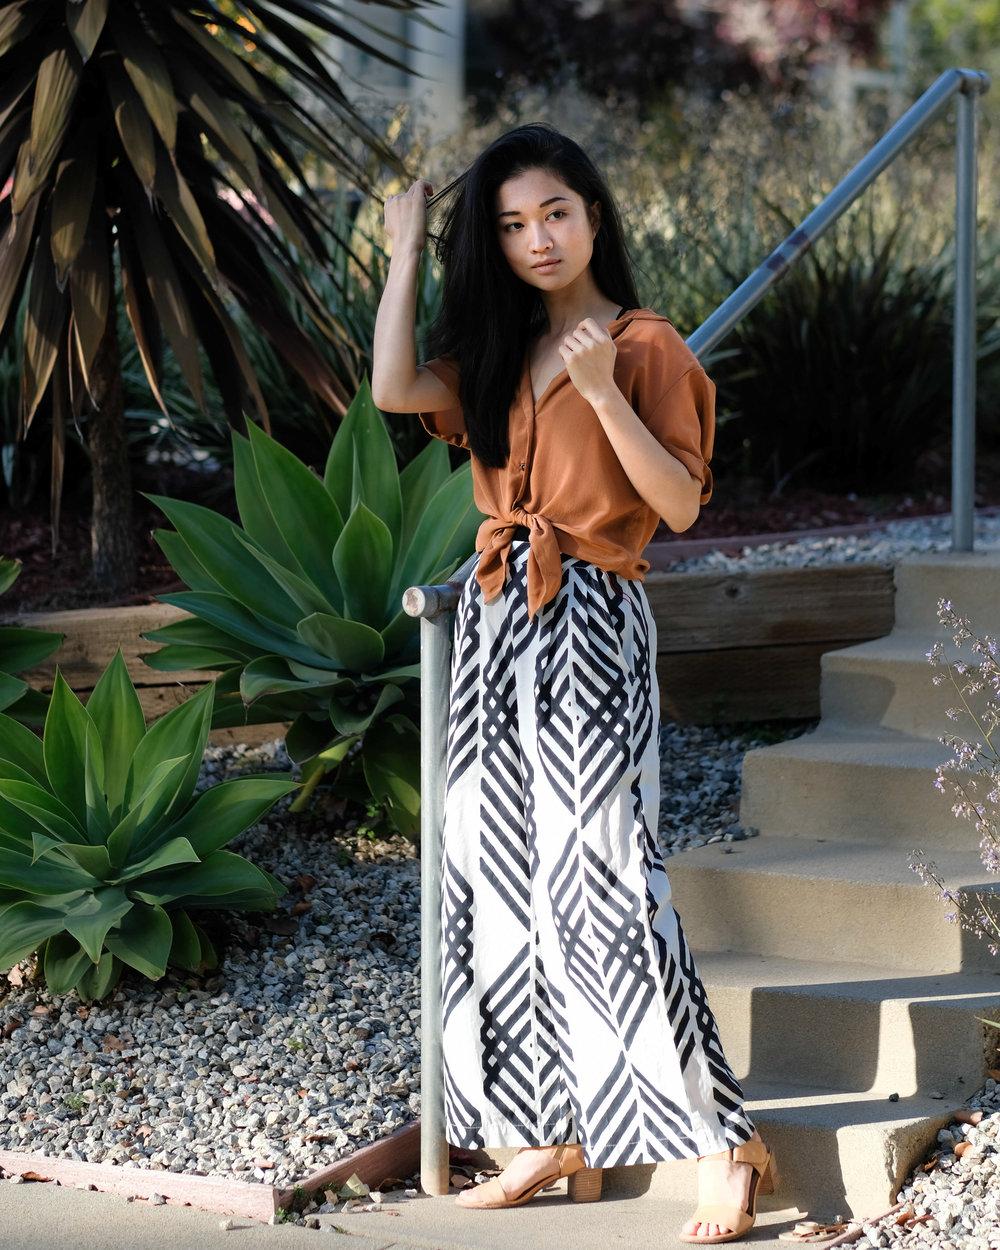 Eco Fashion Blogger Kaméa Chayne @kameachayne